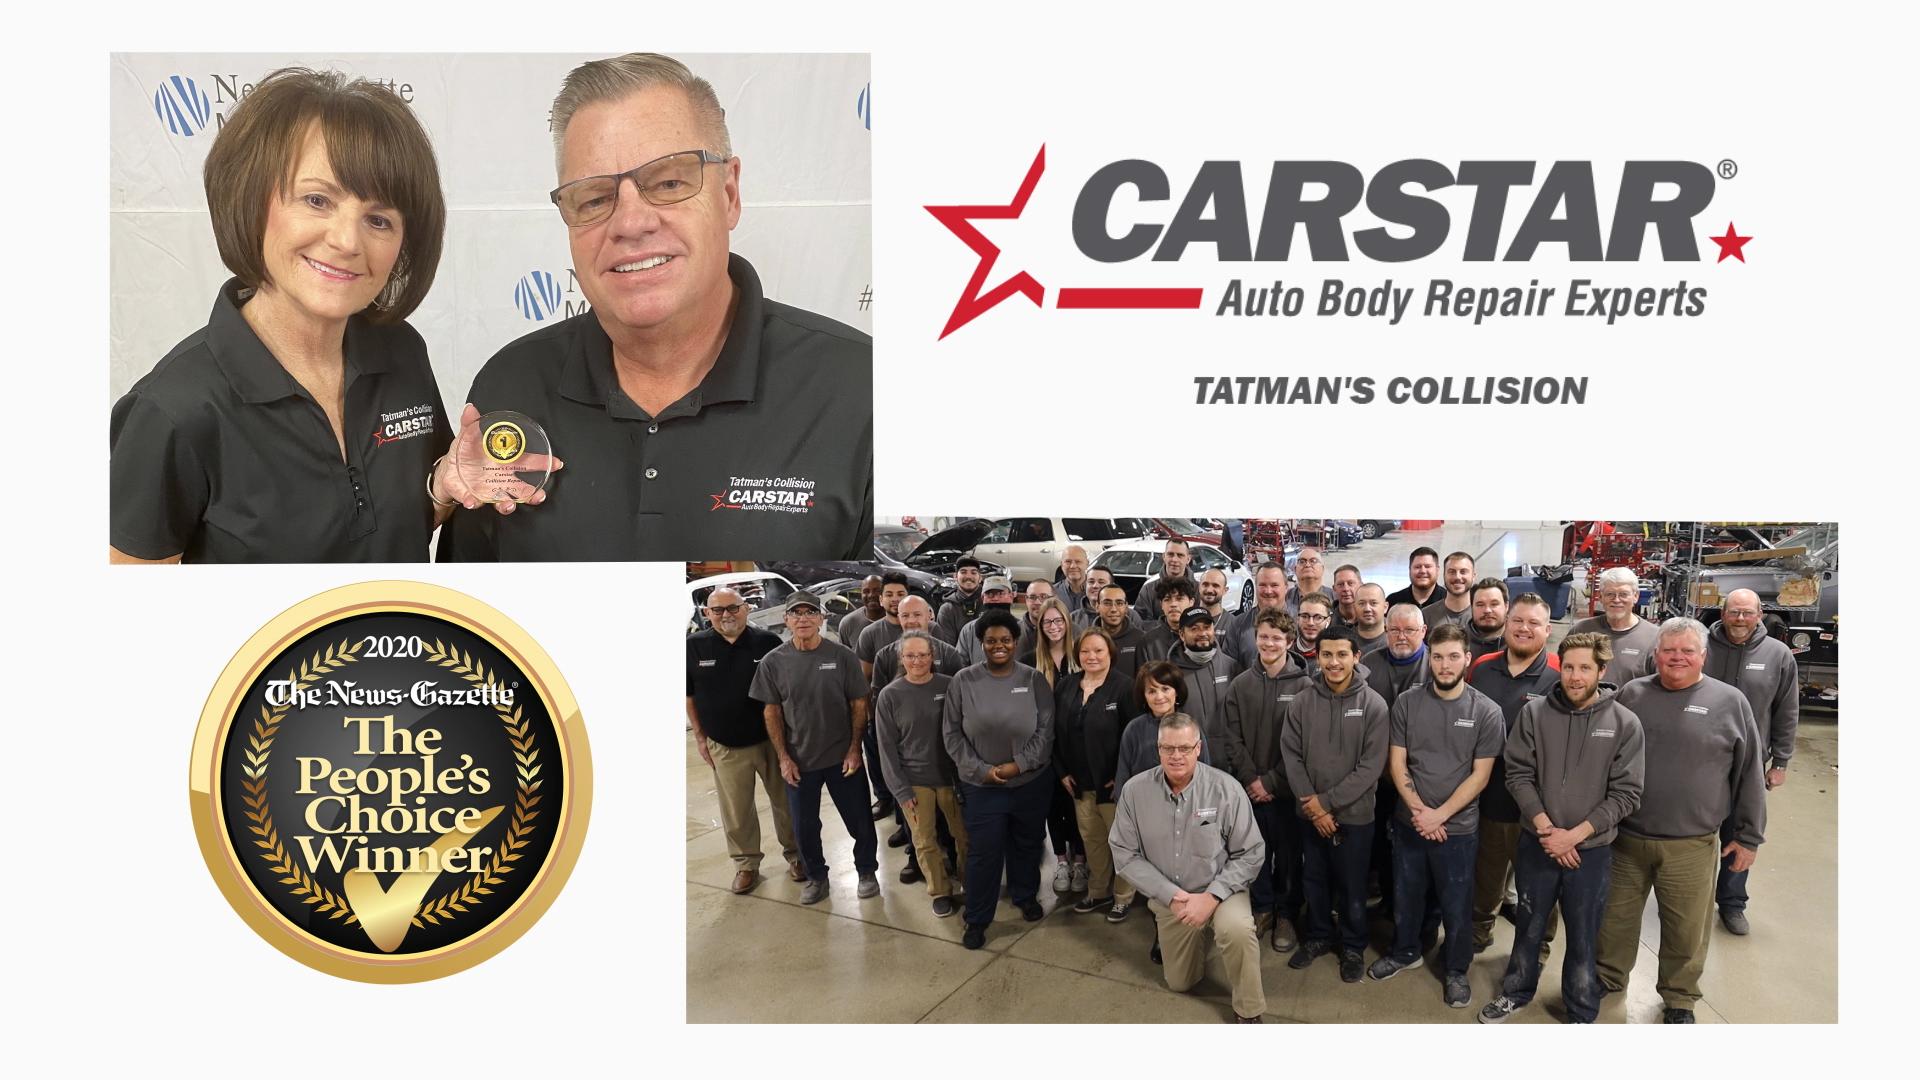 Carstar | People's choice winner 2 years in a row.